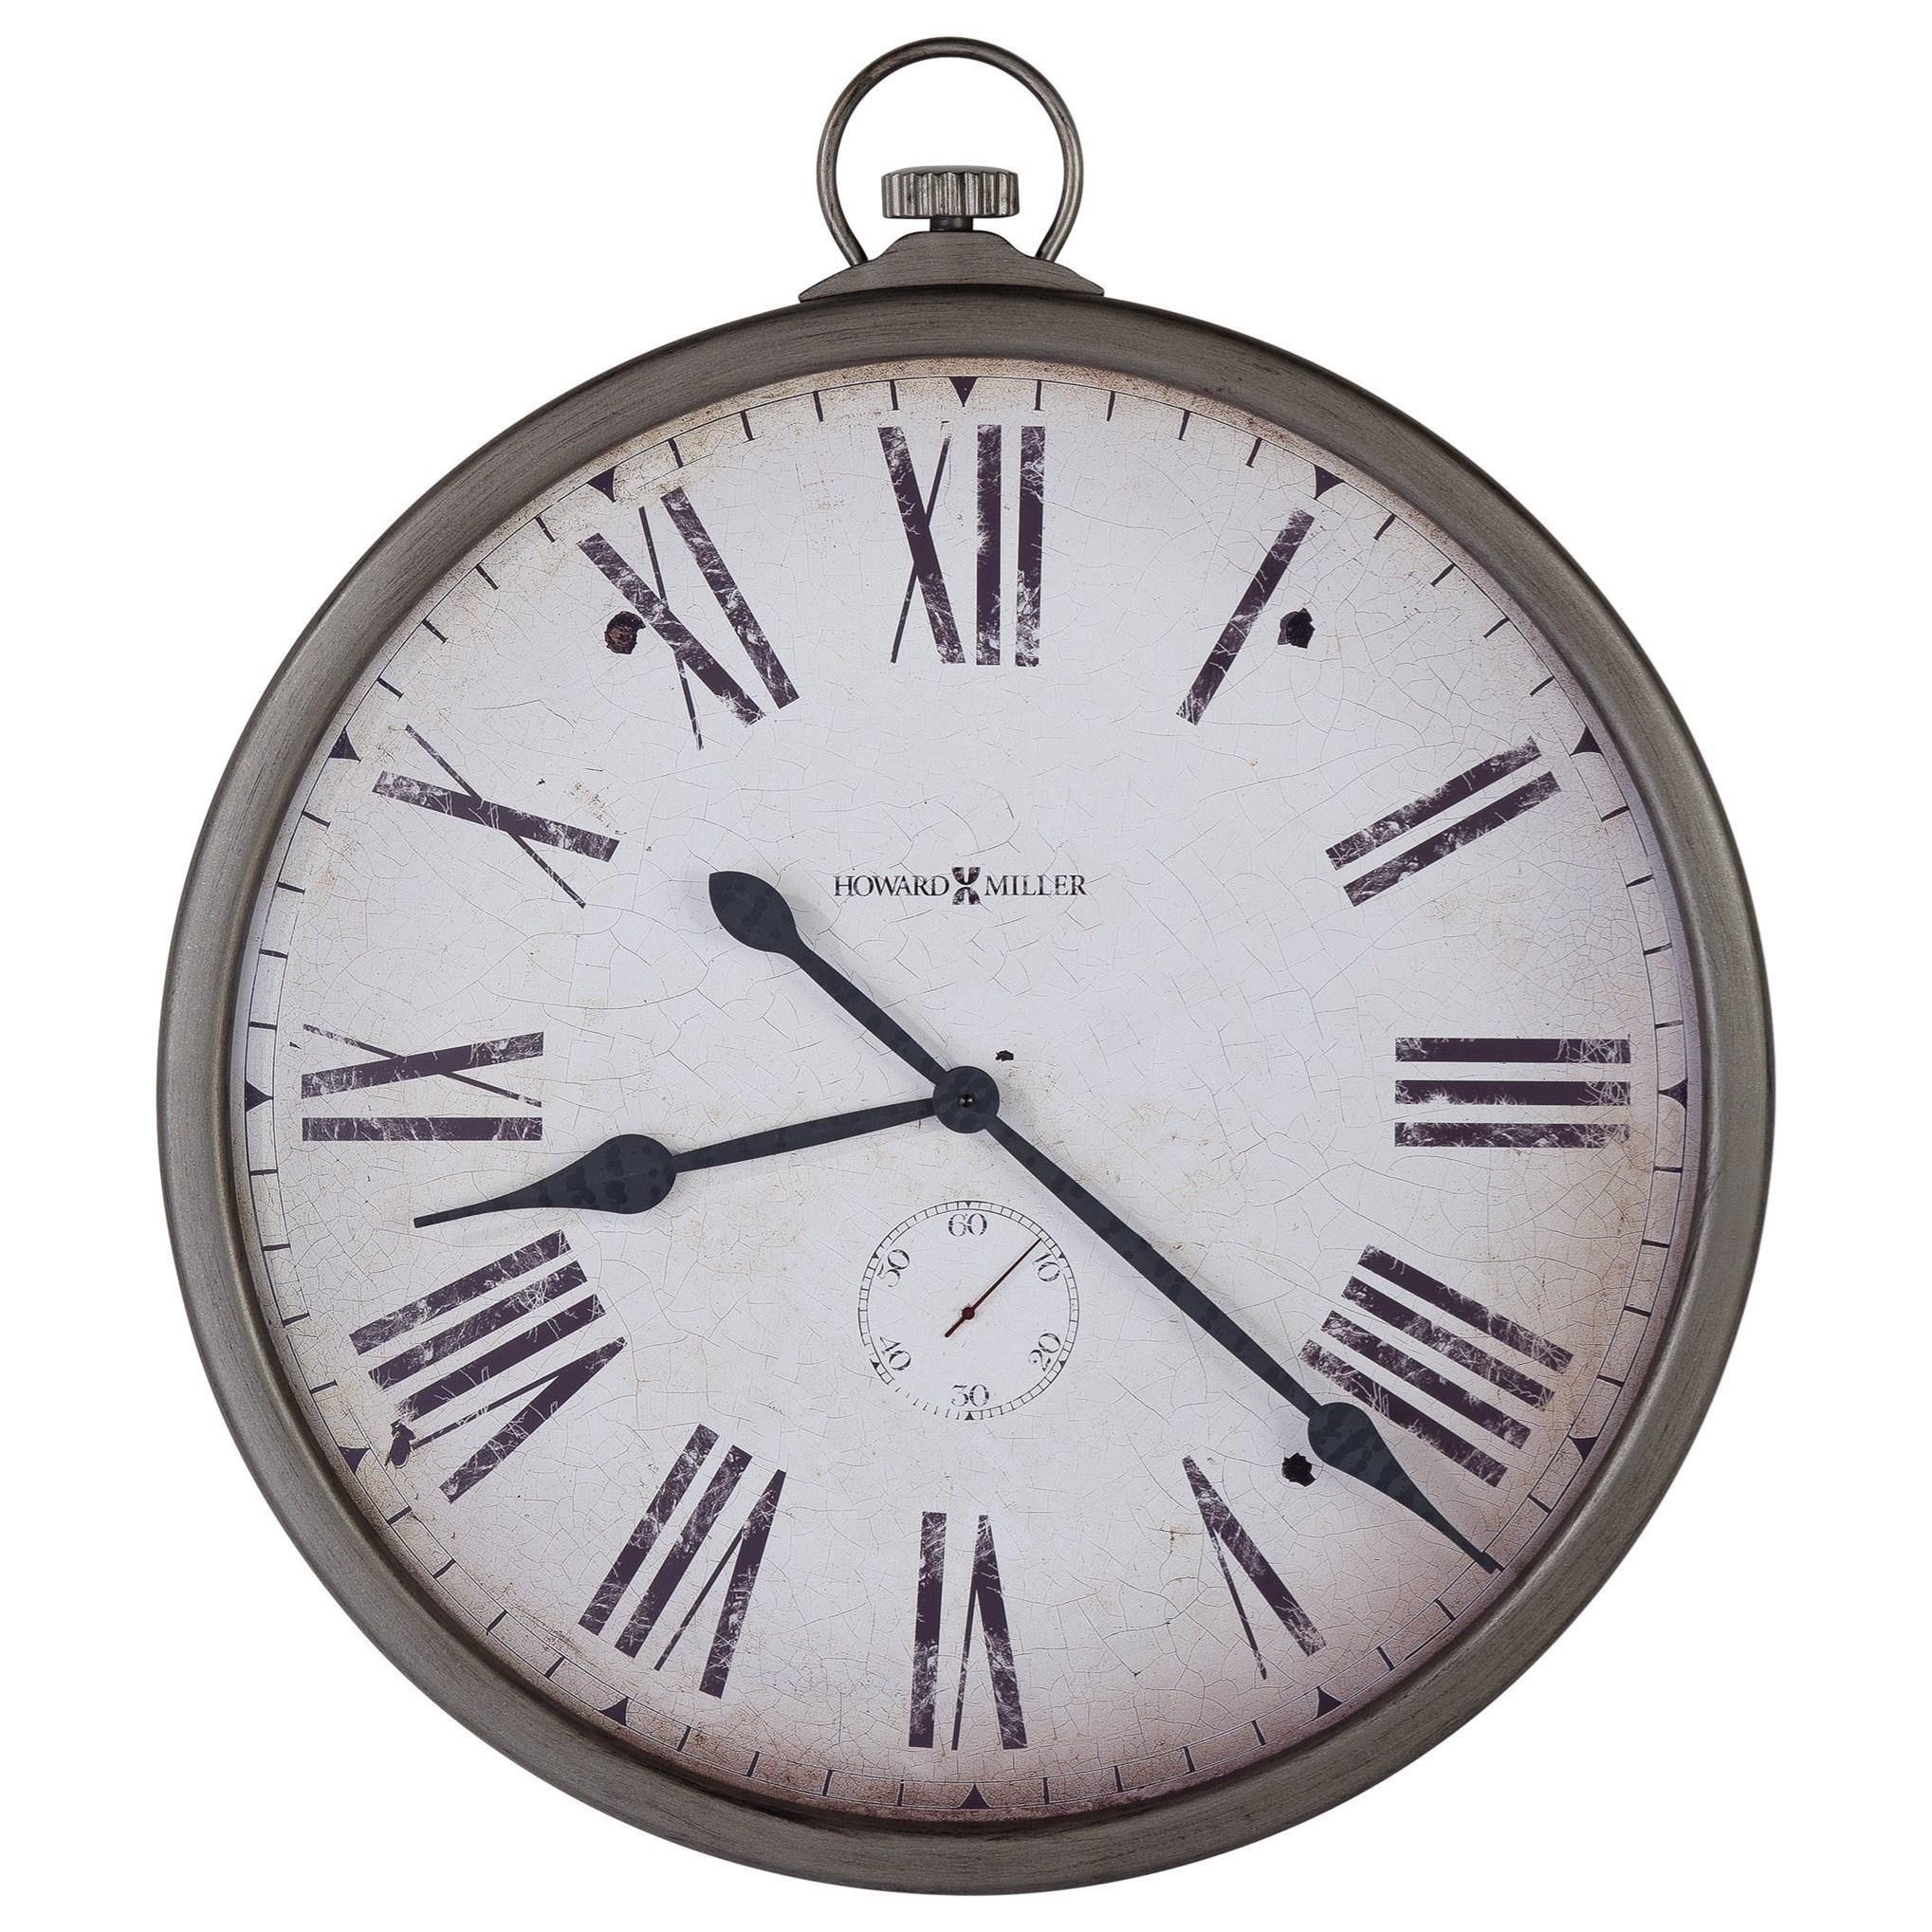 Howard Miller Wall Clock Grandfather Picturesque Picturesboss